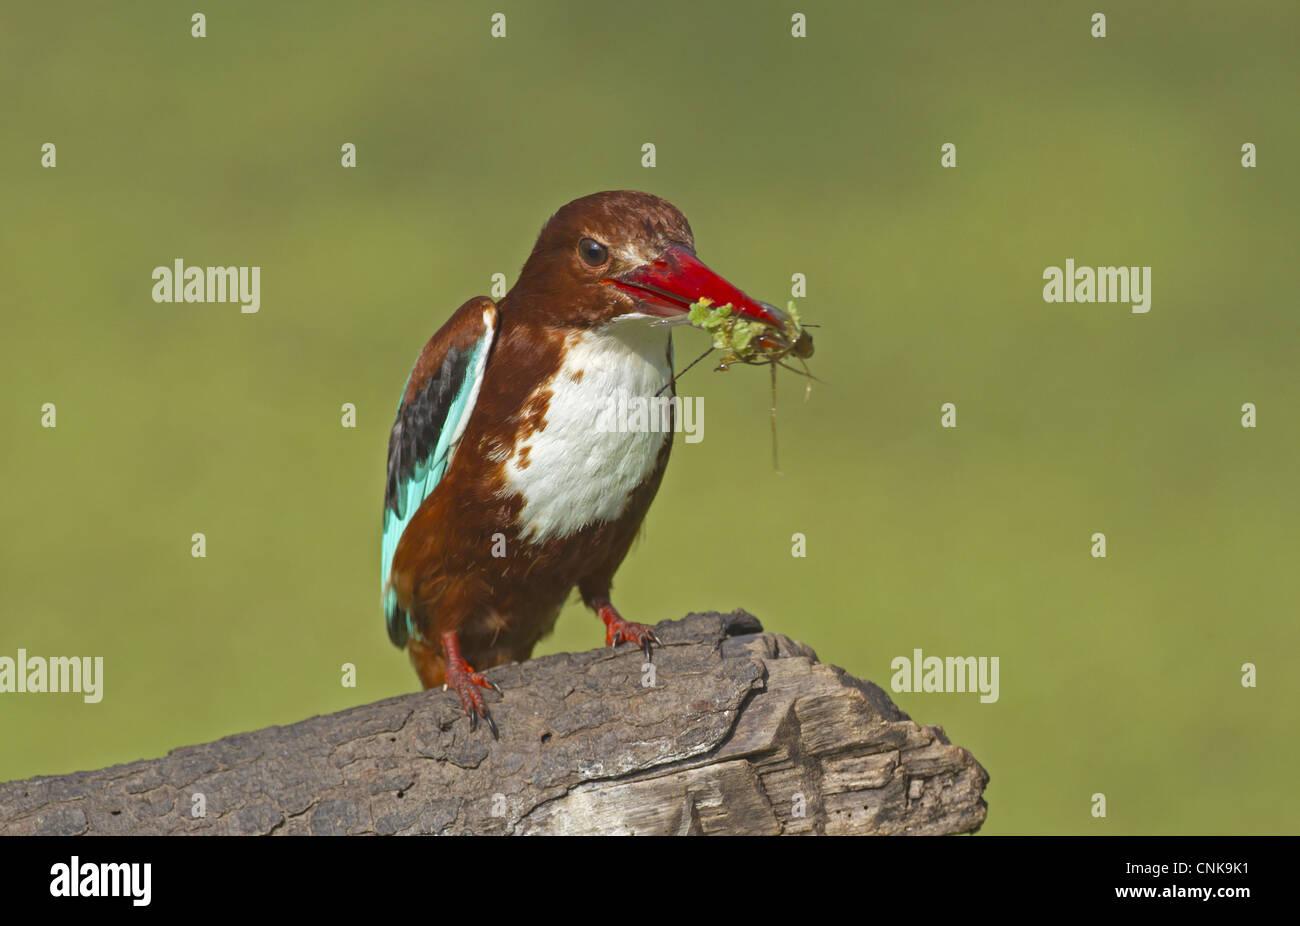 White-throated Kingfisher Halcyon smyrnensis adult fish waterweed in beak Keoladeo Ghana N.P Bharatpur Rajasthan - Stock Image